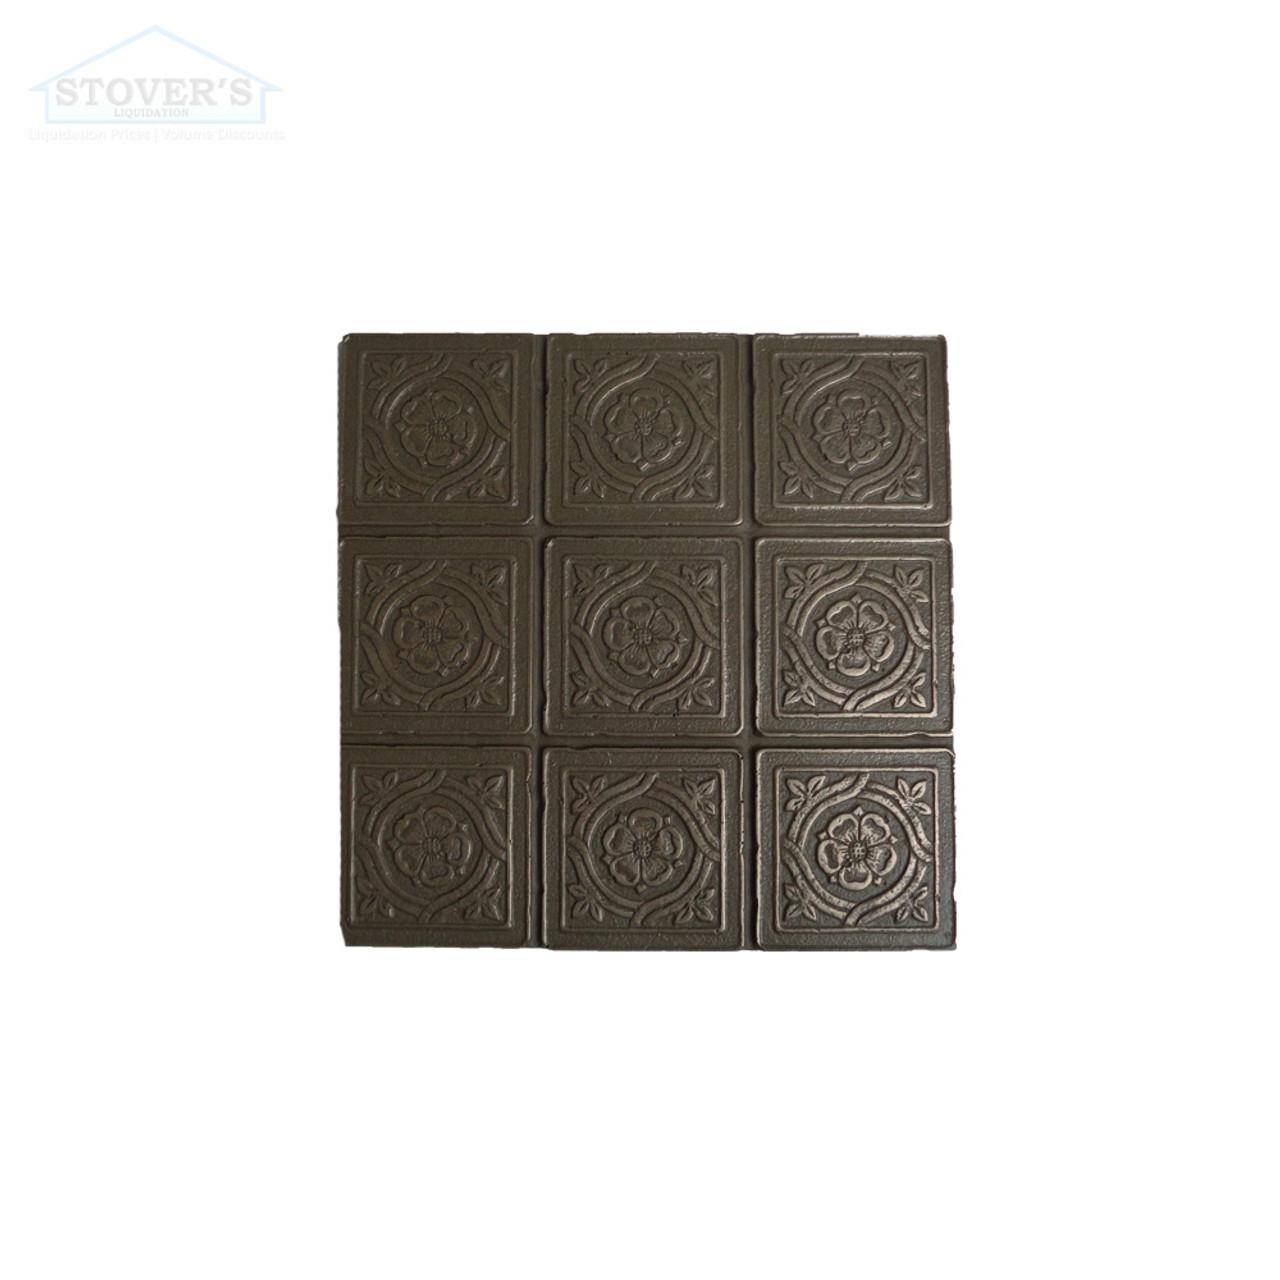 6x6 Deco   Metal Look Decos   Serramnte Scored VIC Bronze   TILE376028003